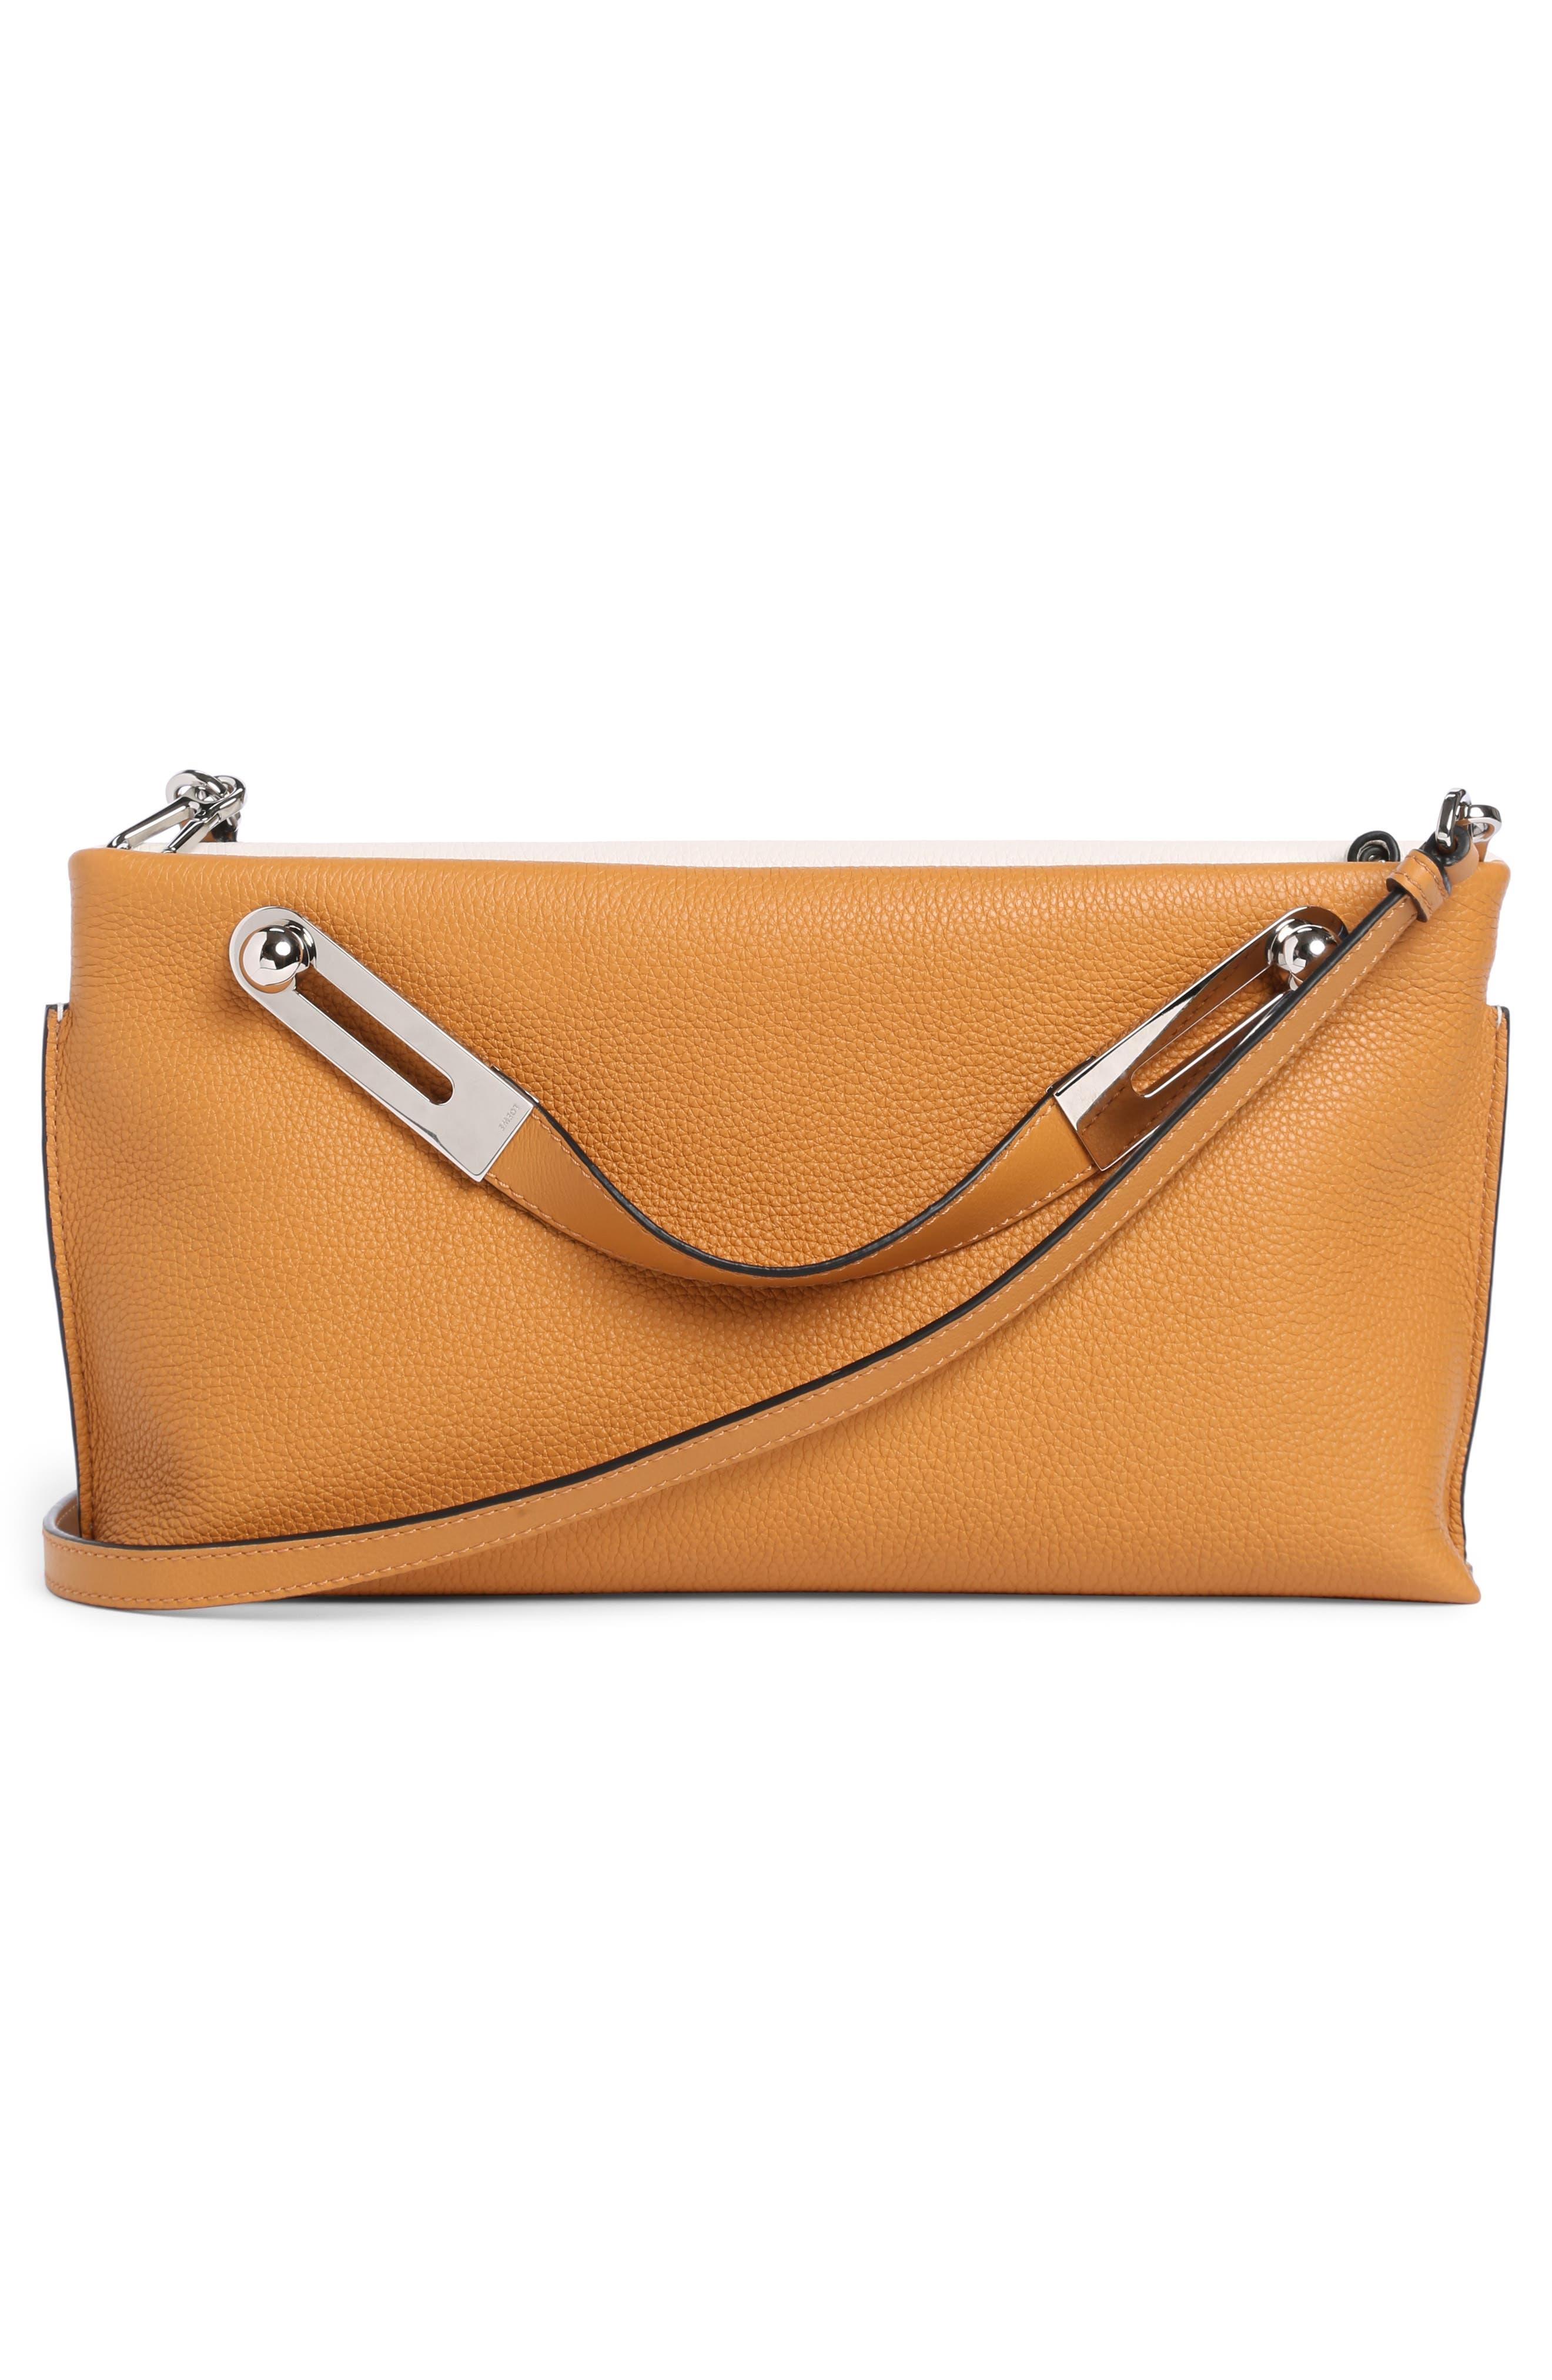 Small Missy Calfskin Leather Crossbody Bag,                             Alternate thumbnail 2, color,                             Soft White/ Amber